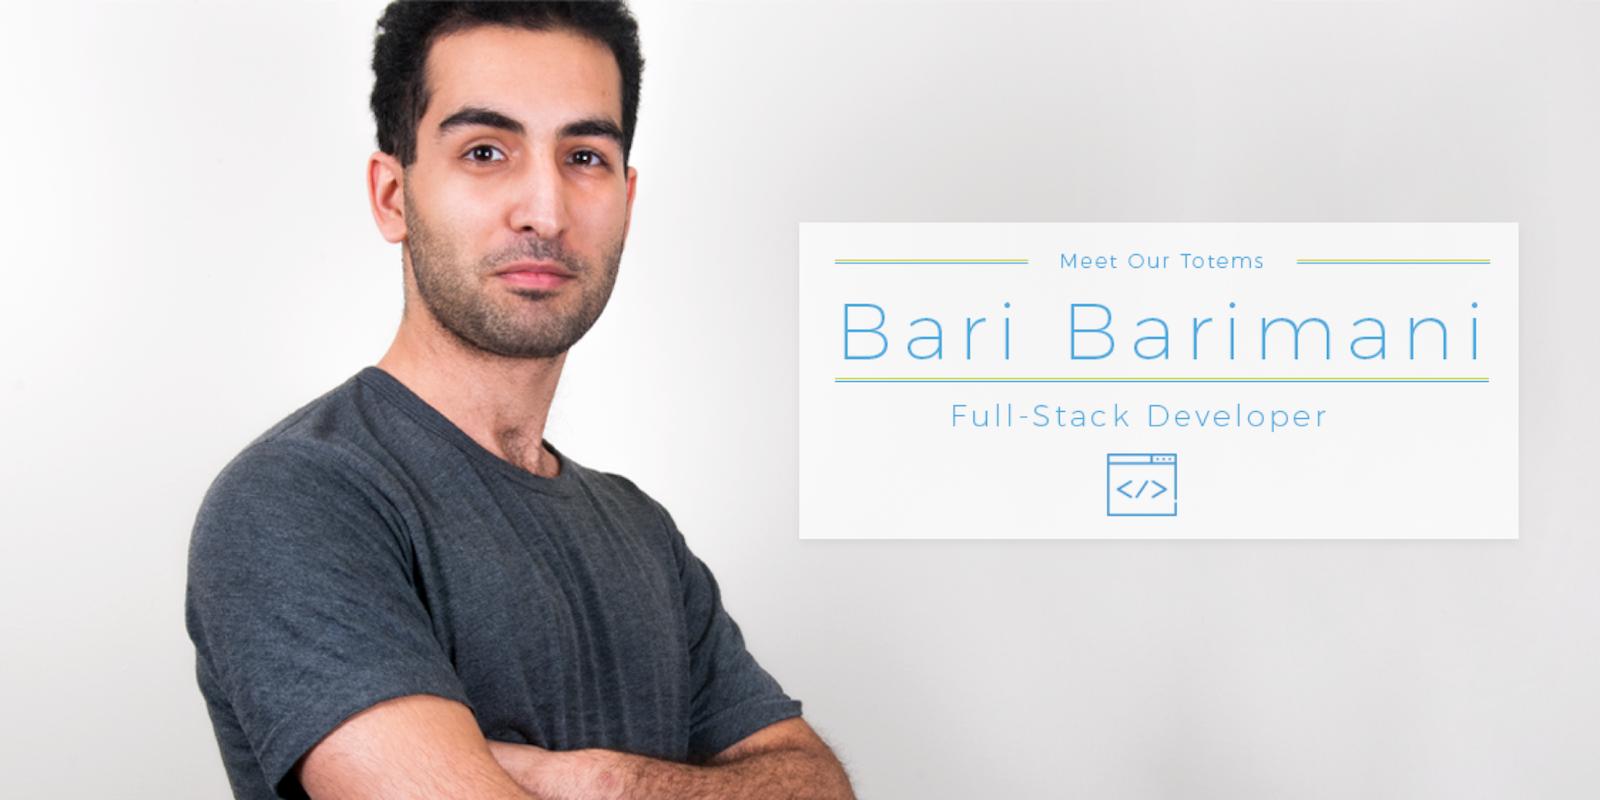 Meet Our Totems Full Stack Developer